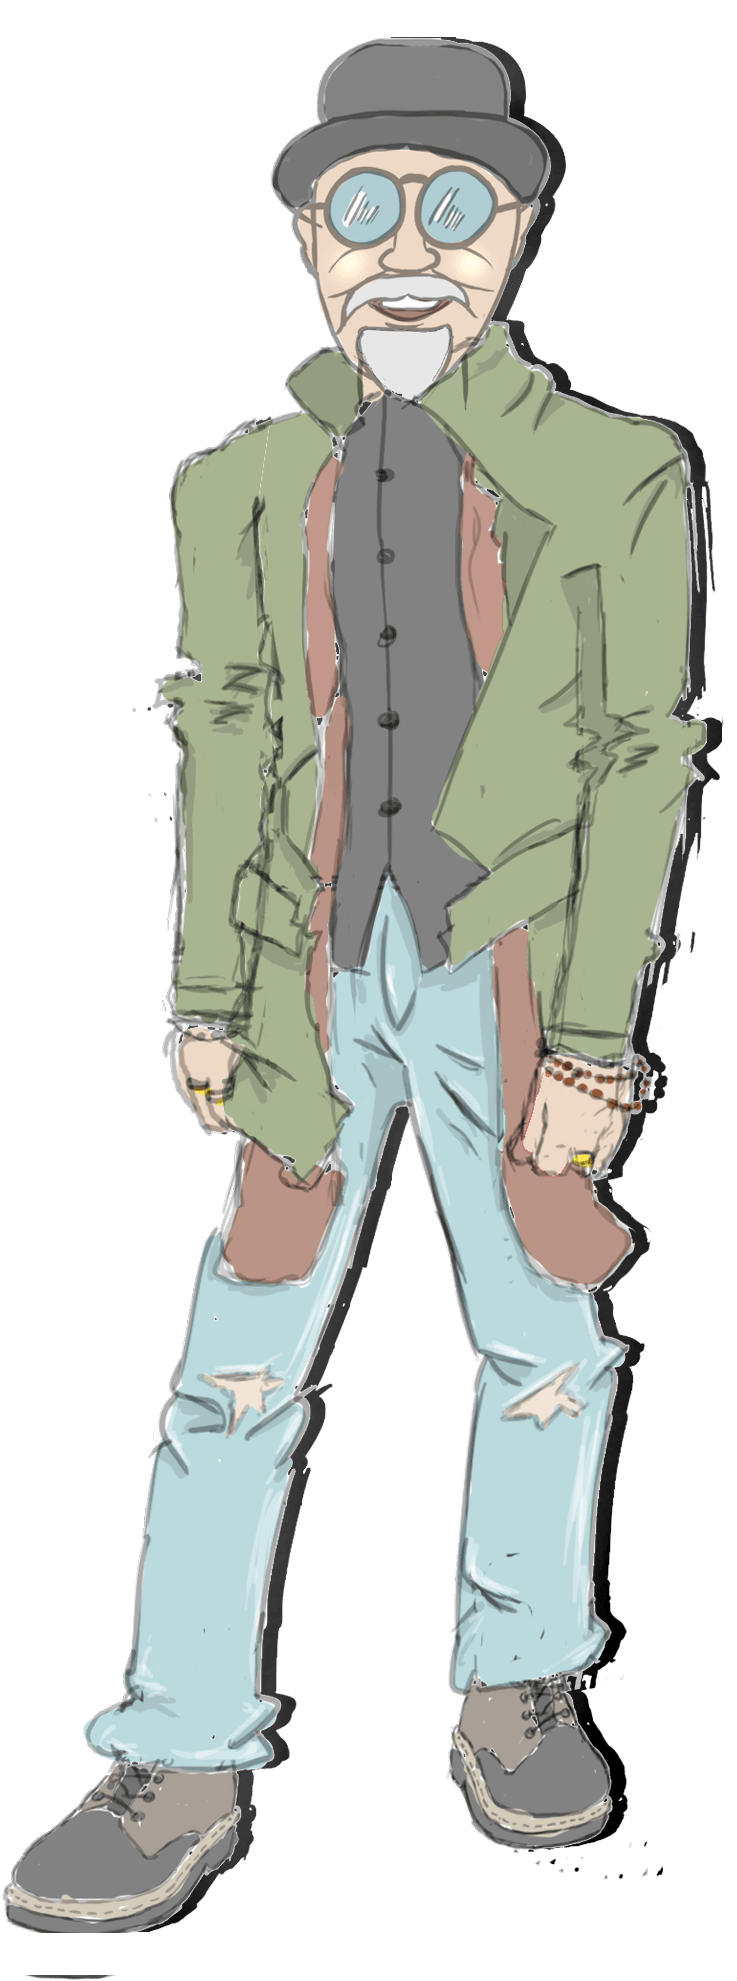 Flötschman Comik Figur